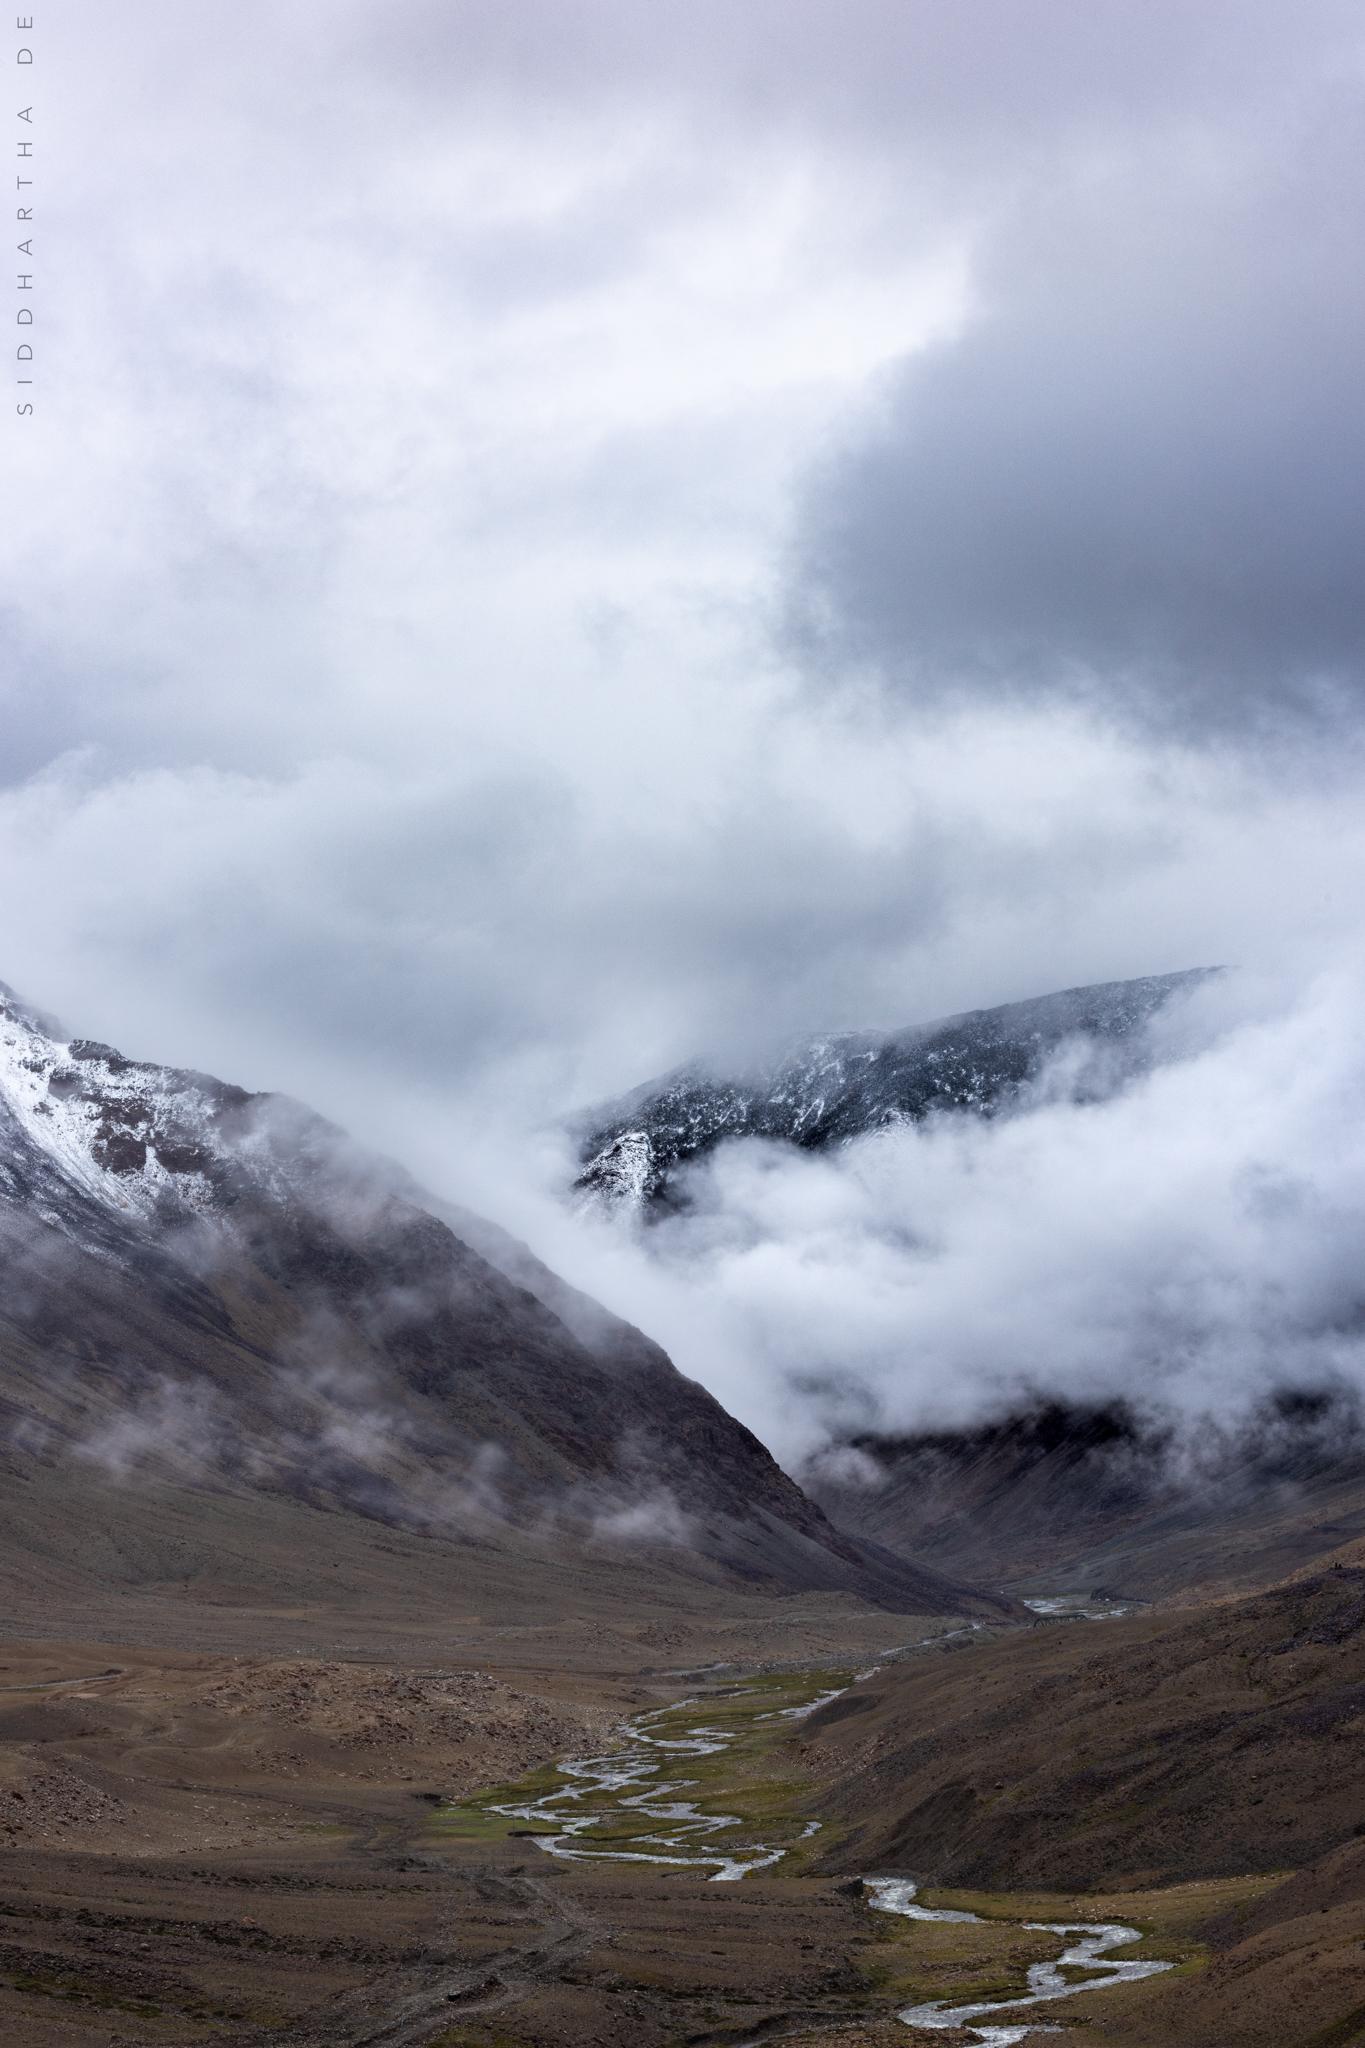 SD Ladakh 2019 19.jpg